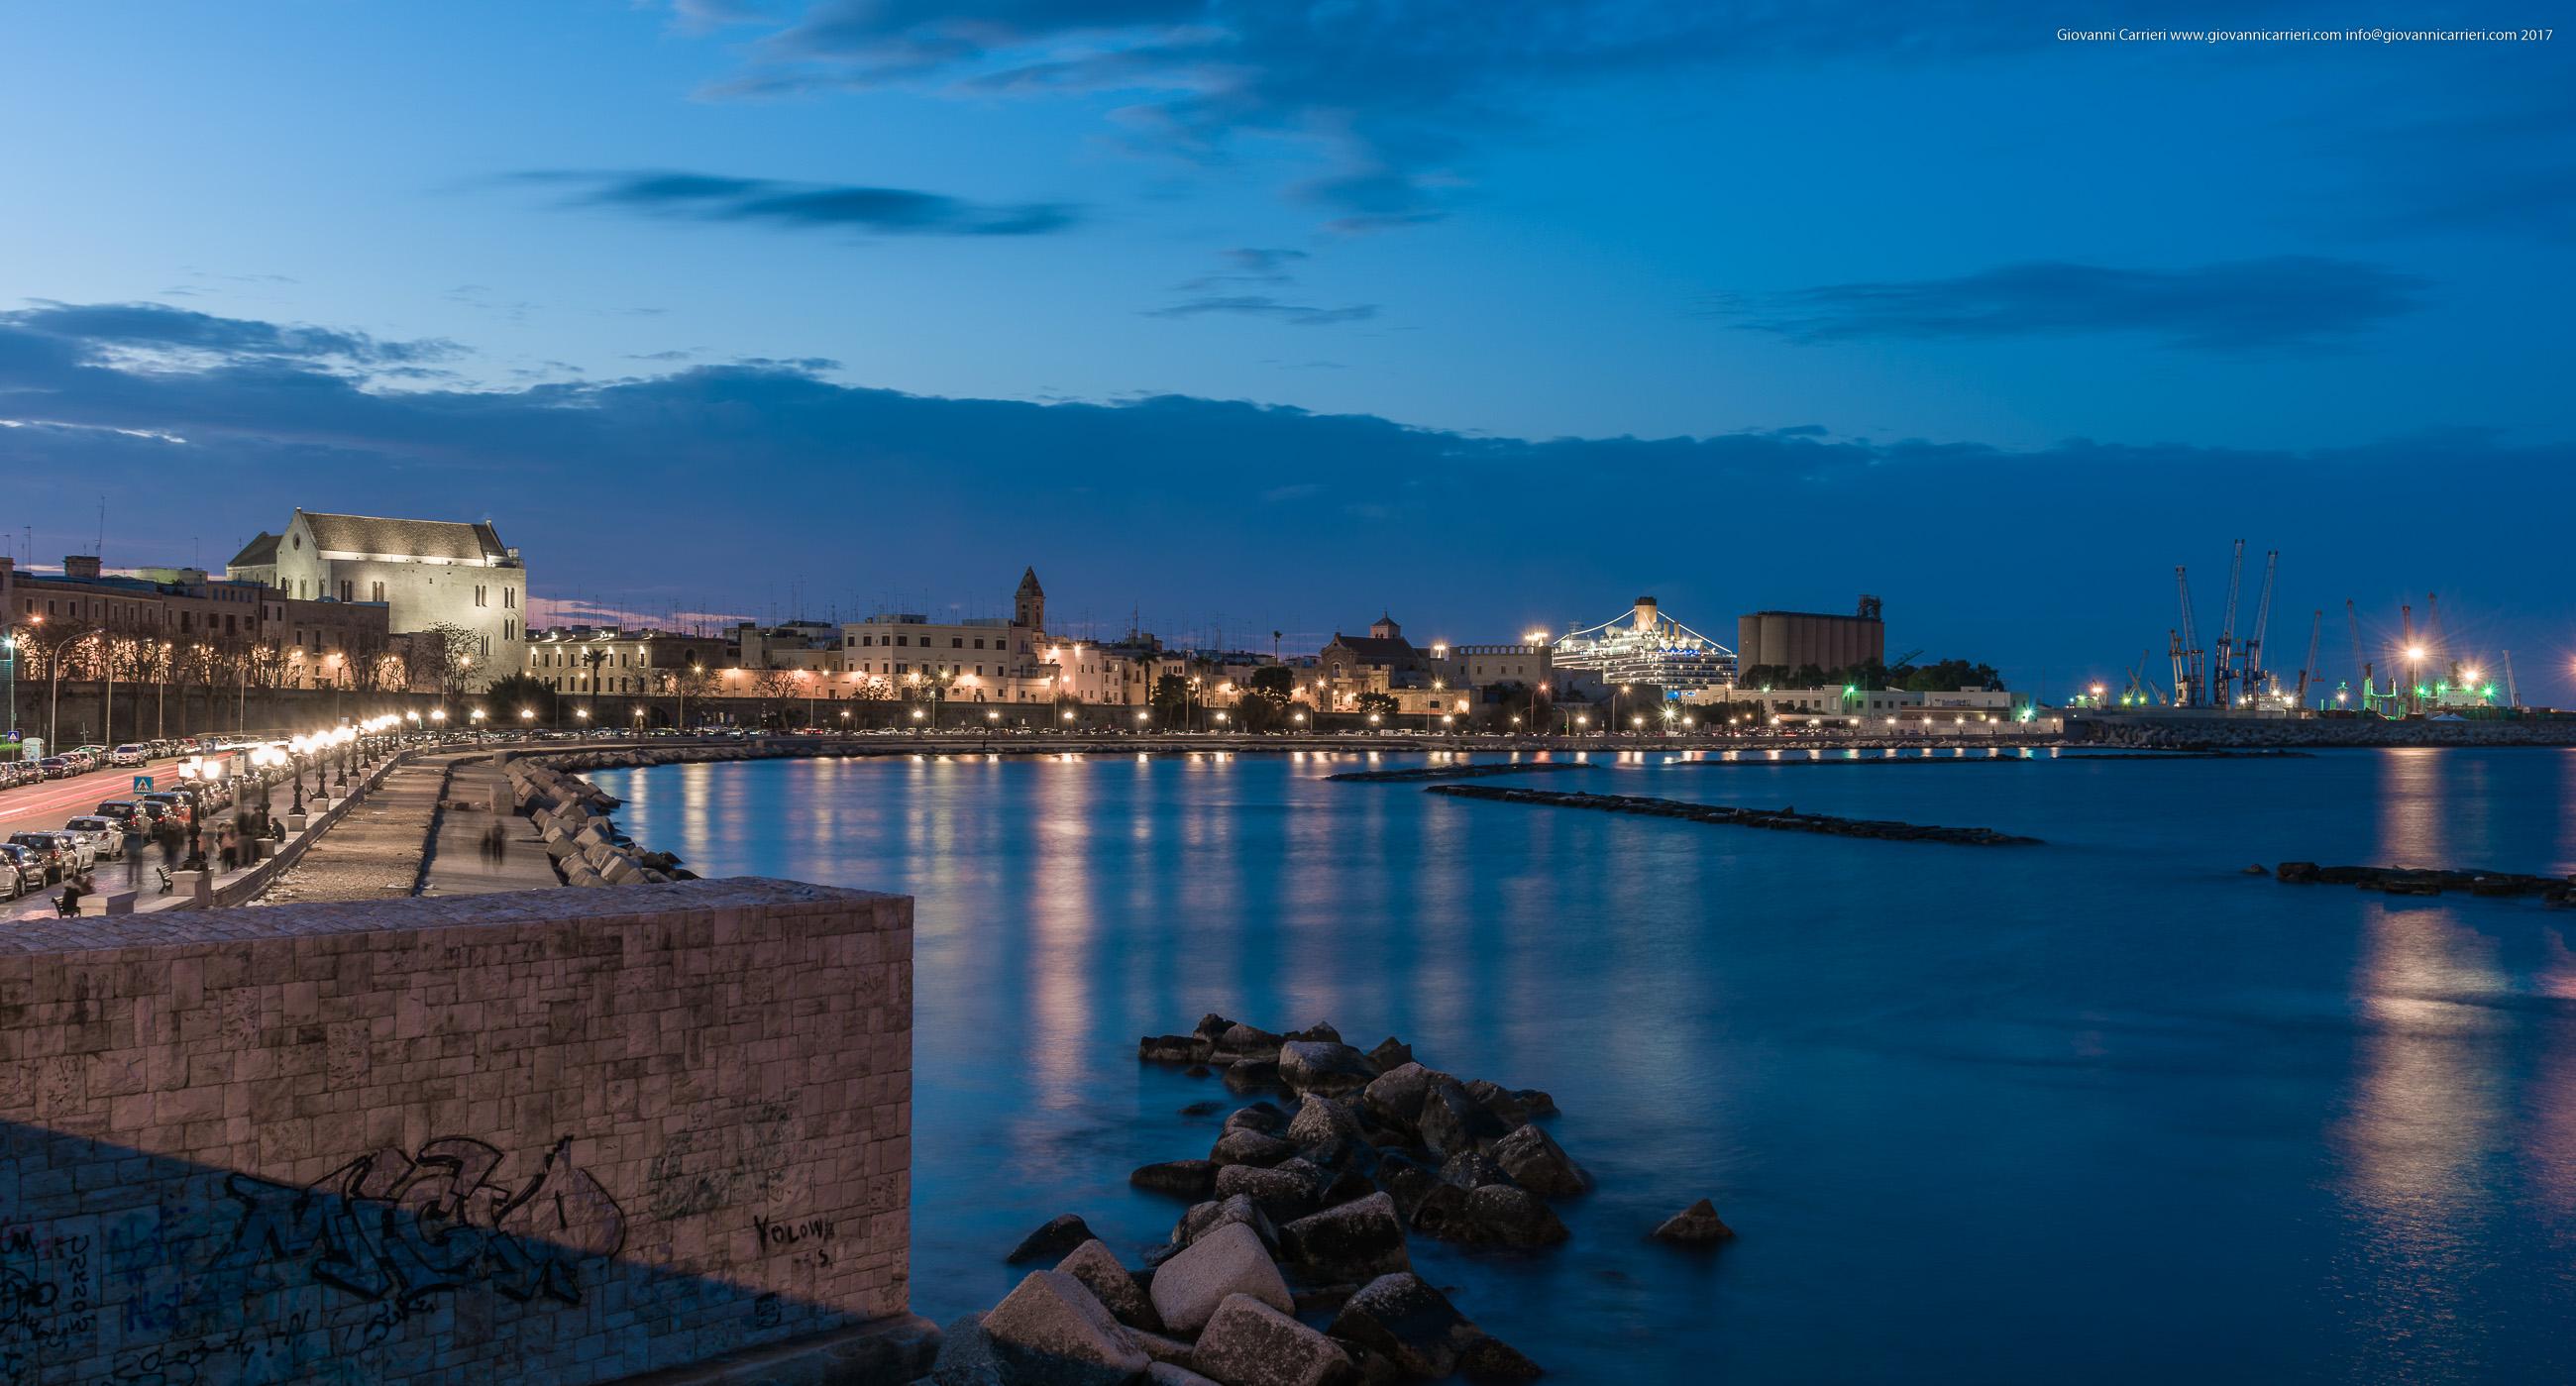 Promenade viewed from pier Sant'Antonio